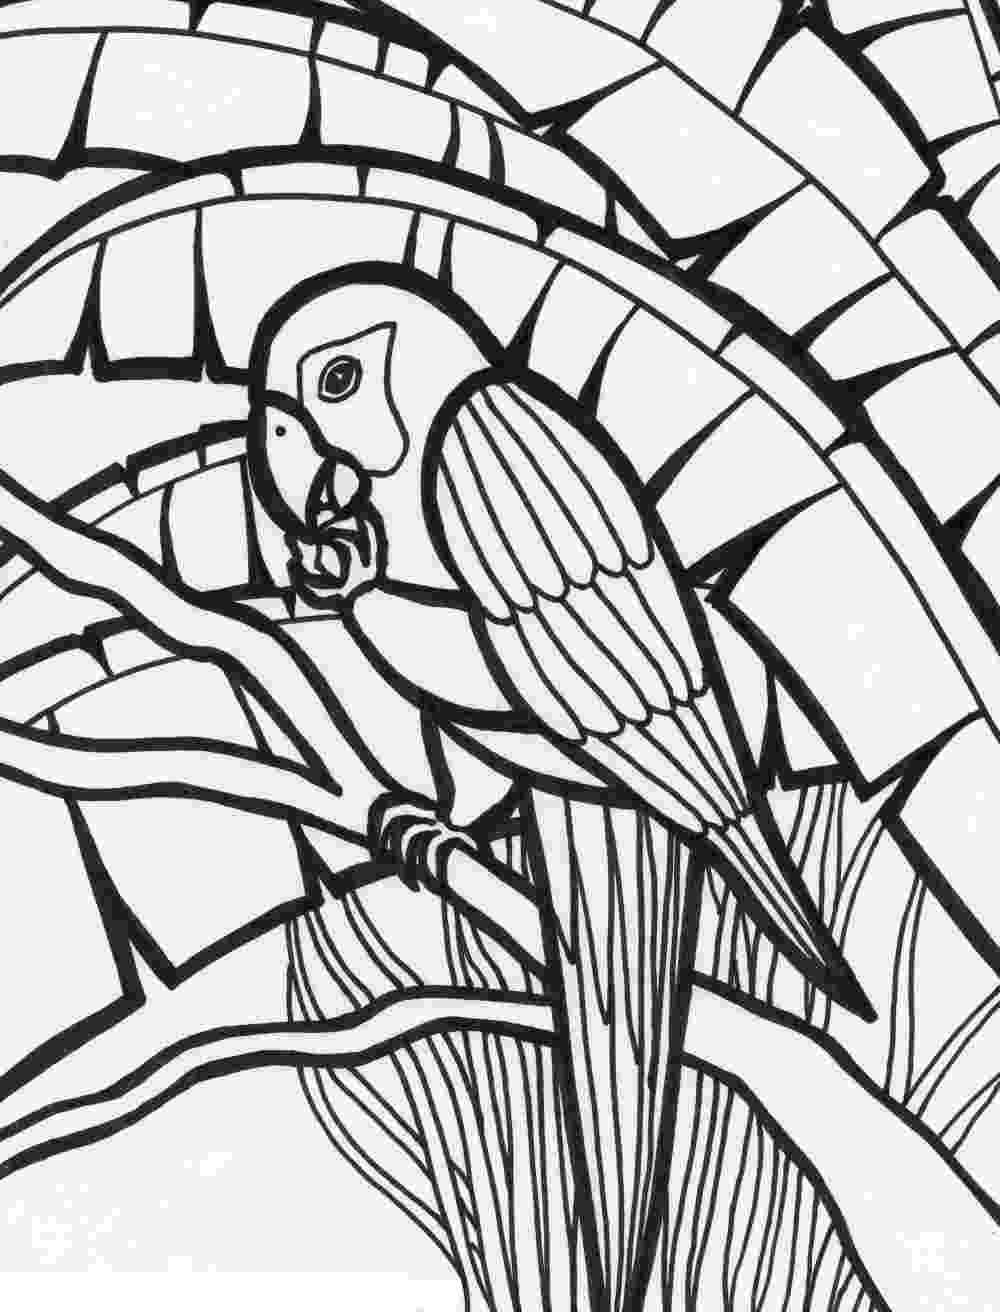 coloring pages parrot free printable parrot coloring pages for kids animal place coloring pages parrot